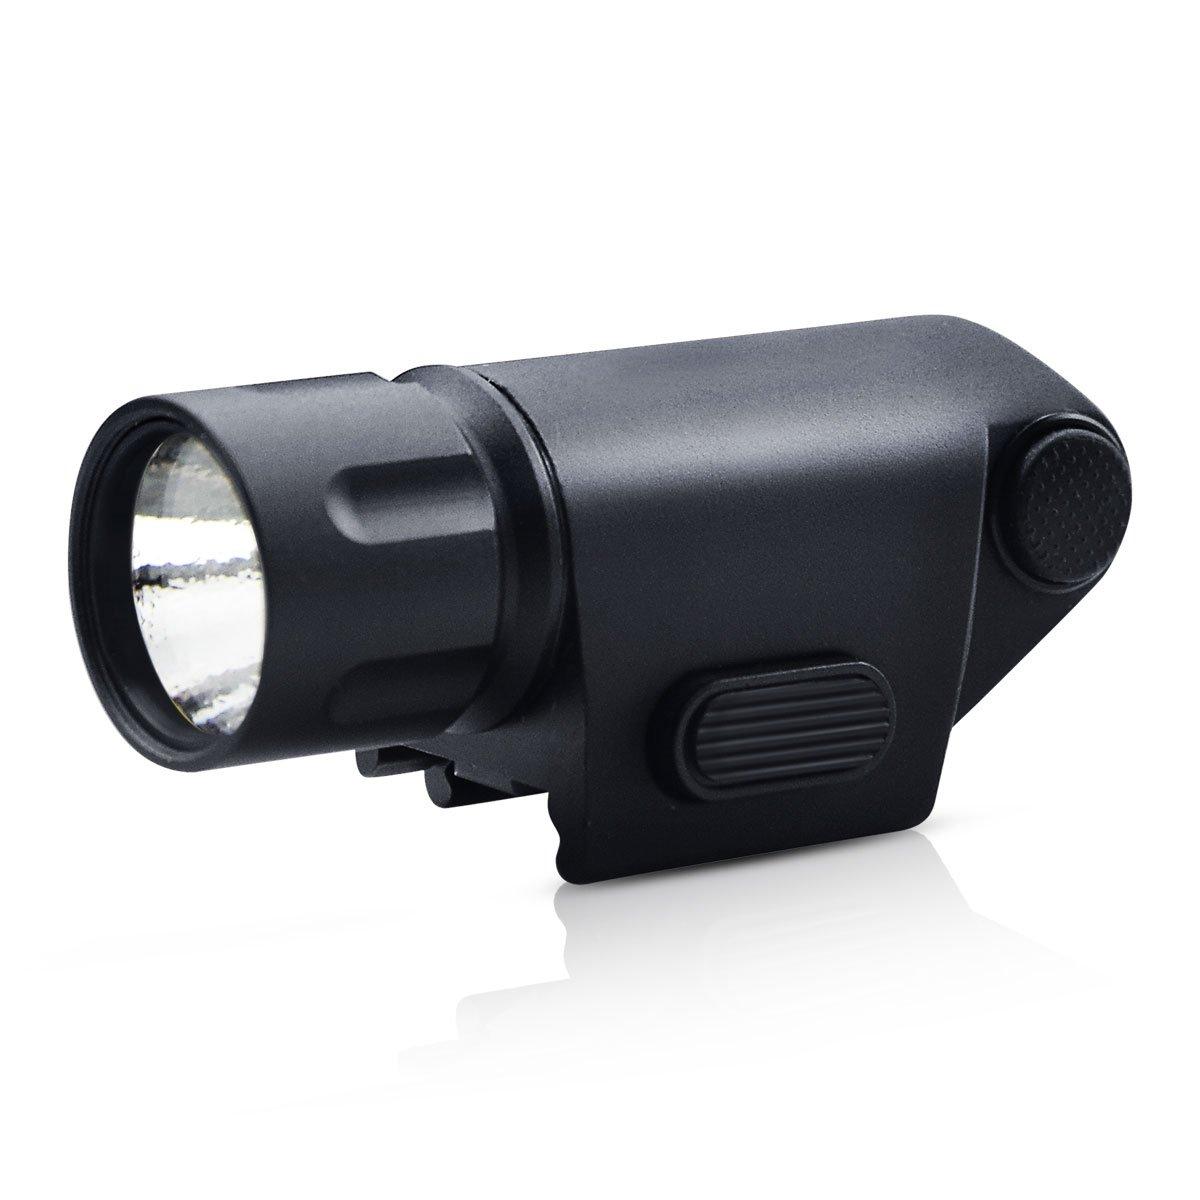 OTW Rifle LED Flashlight-Tatical Weaver Pistol Gun Handgun 500LM LED Flashlight Weapon Light For 20mm Picatinny Rail